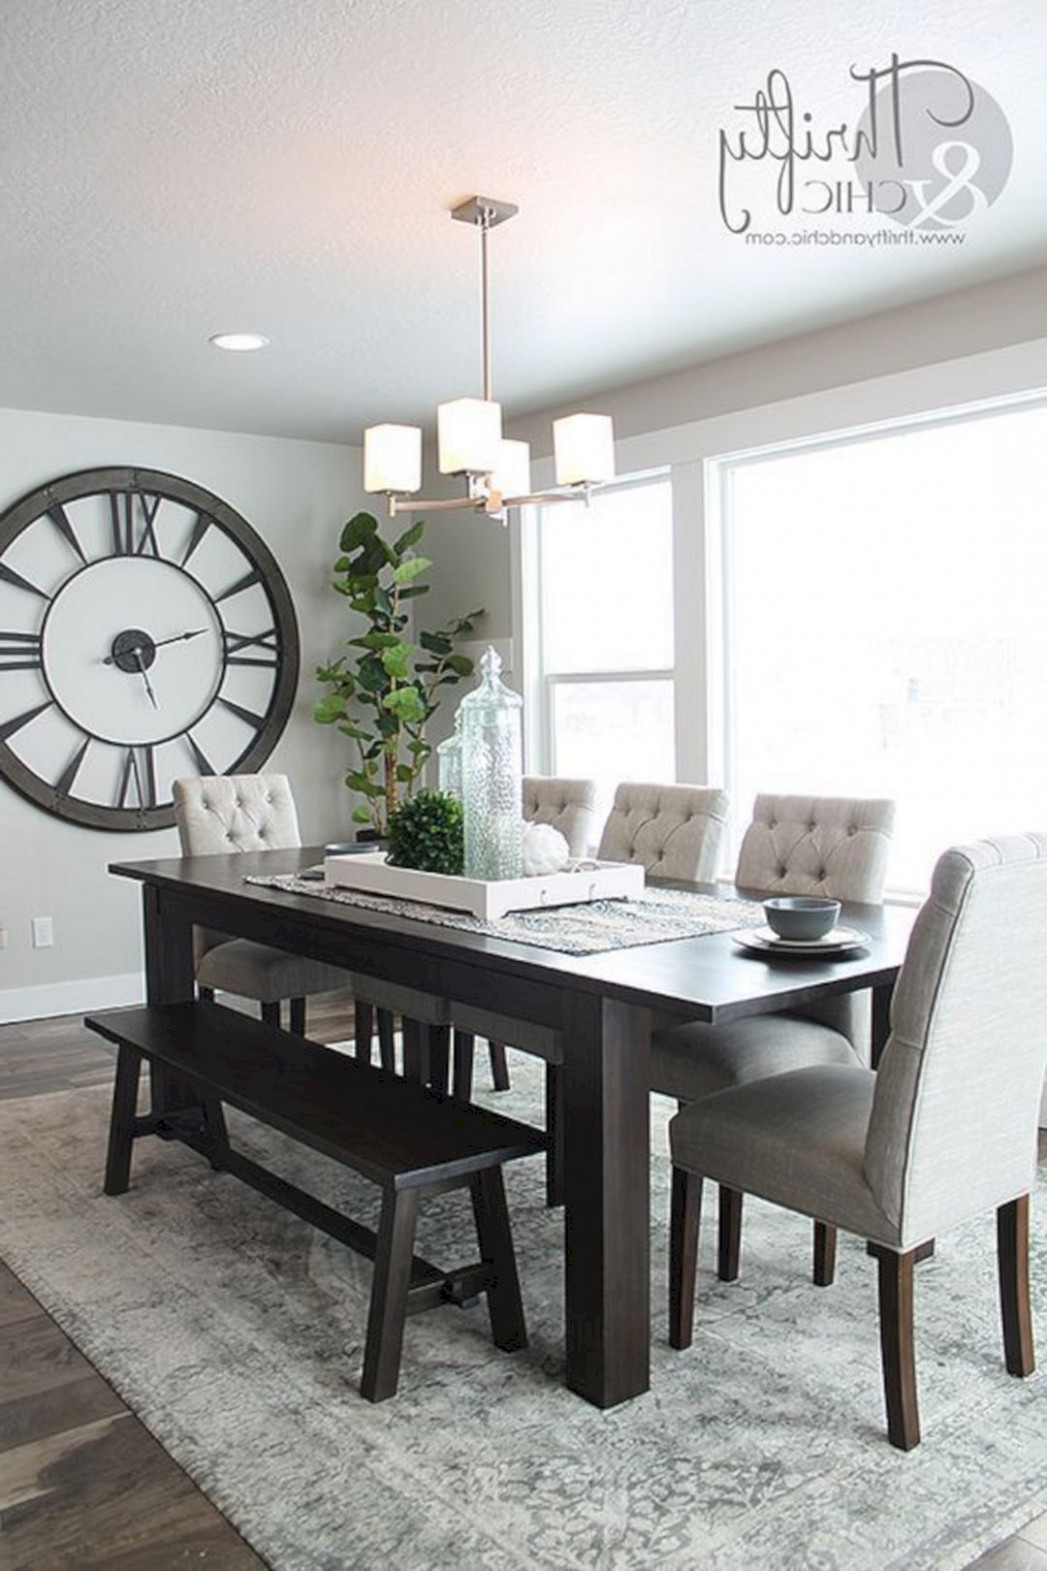 9 Simple and Minimalist Dining Table Decor Ideas#decor #dining  - Dining Room Ideas Simple